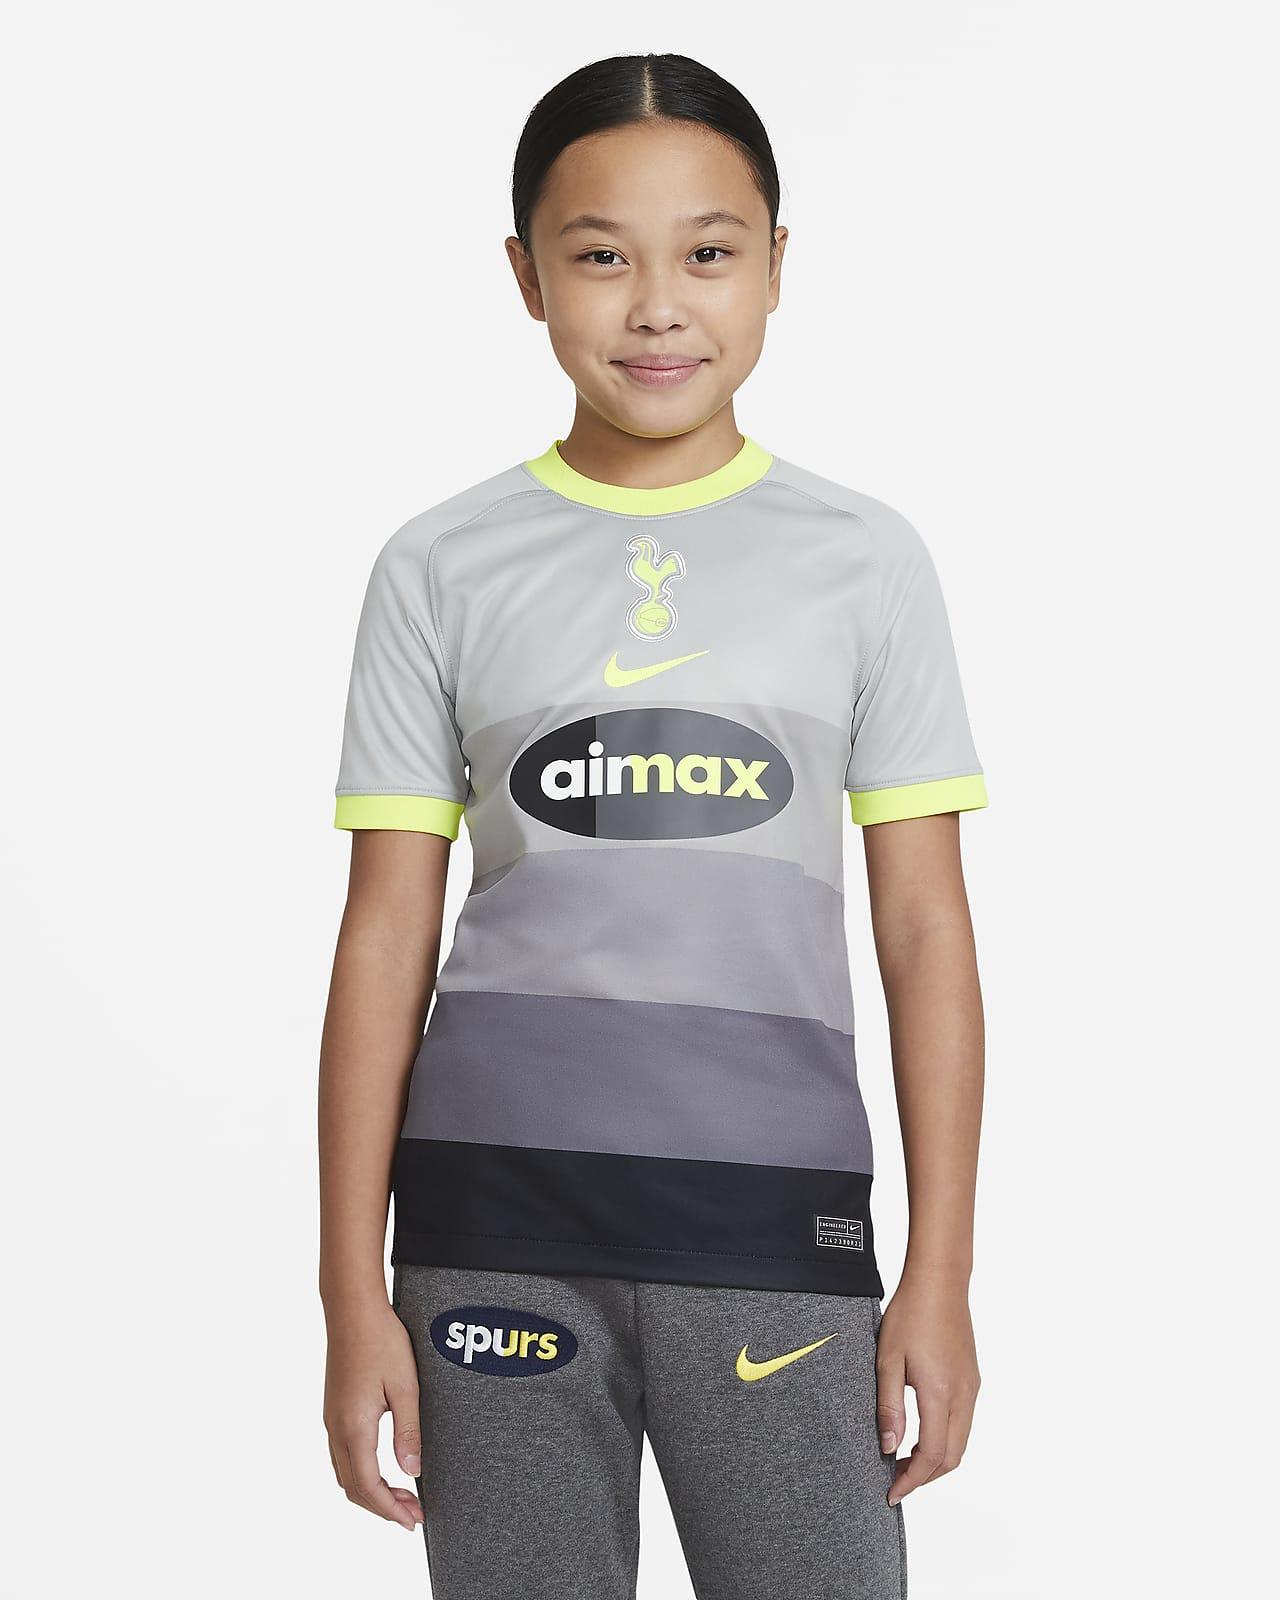 Tottenham Hotspur Stadium Air Max Older Kids' Football Shirt